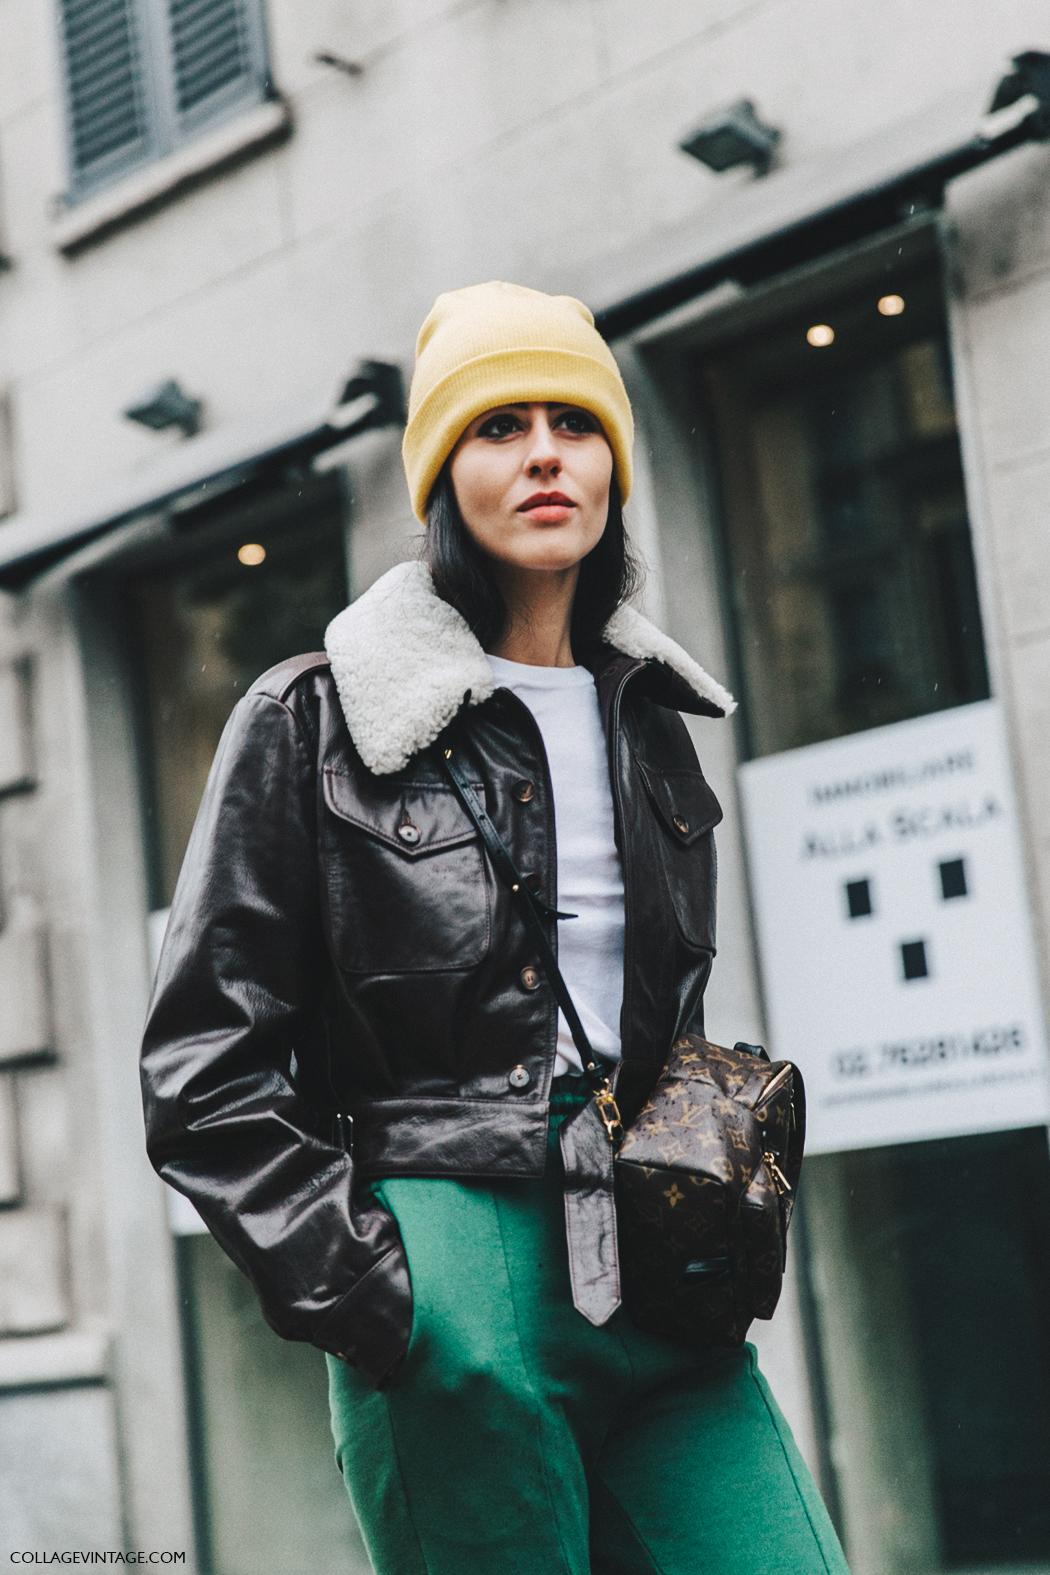 Milan_Fashion_Week_Fall_16-MFW-Street_Style-Collage_Vintage-Gilda_Ambrossio-Yellow_Beanie-Shearling_Jacket-Green-2